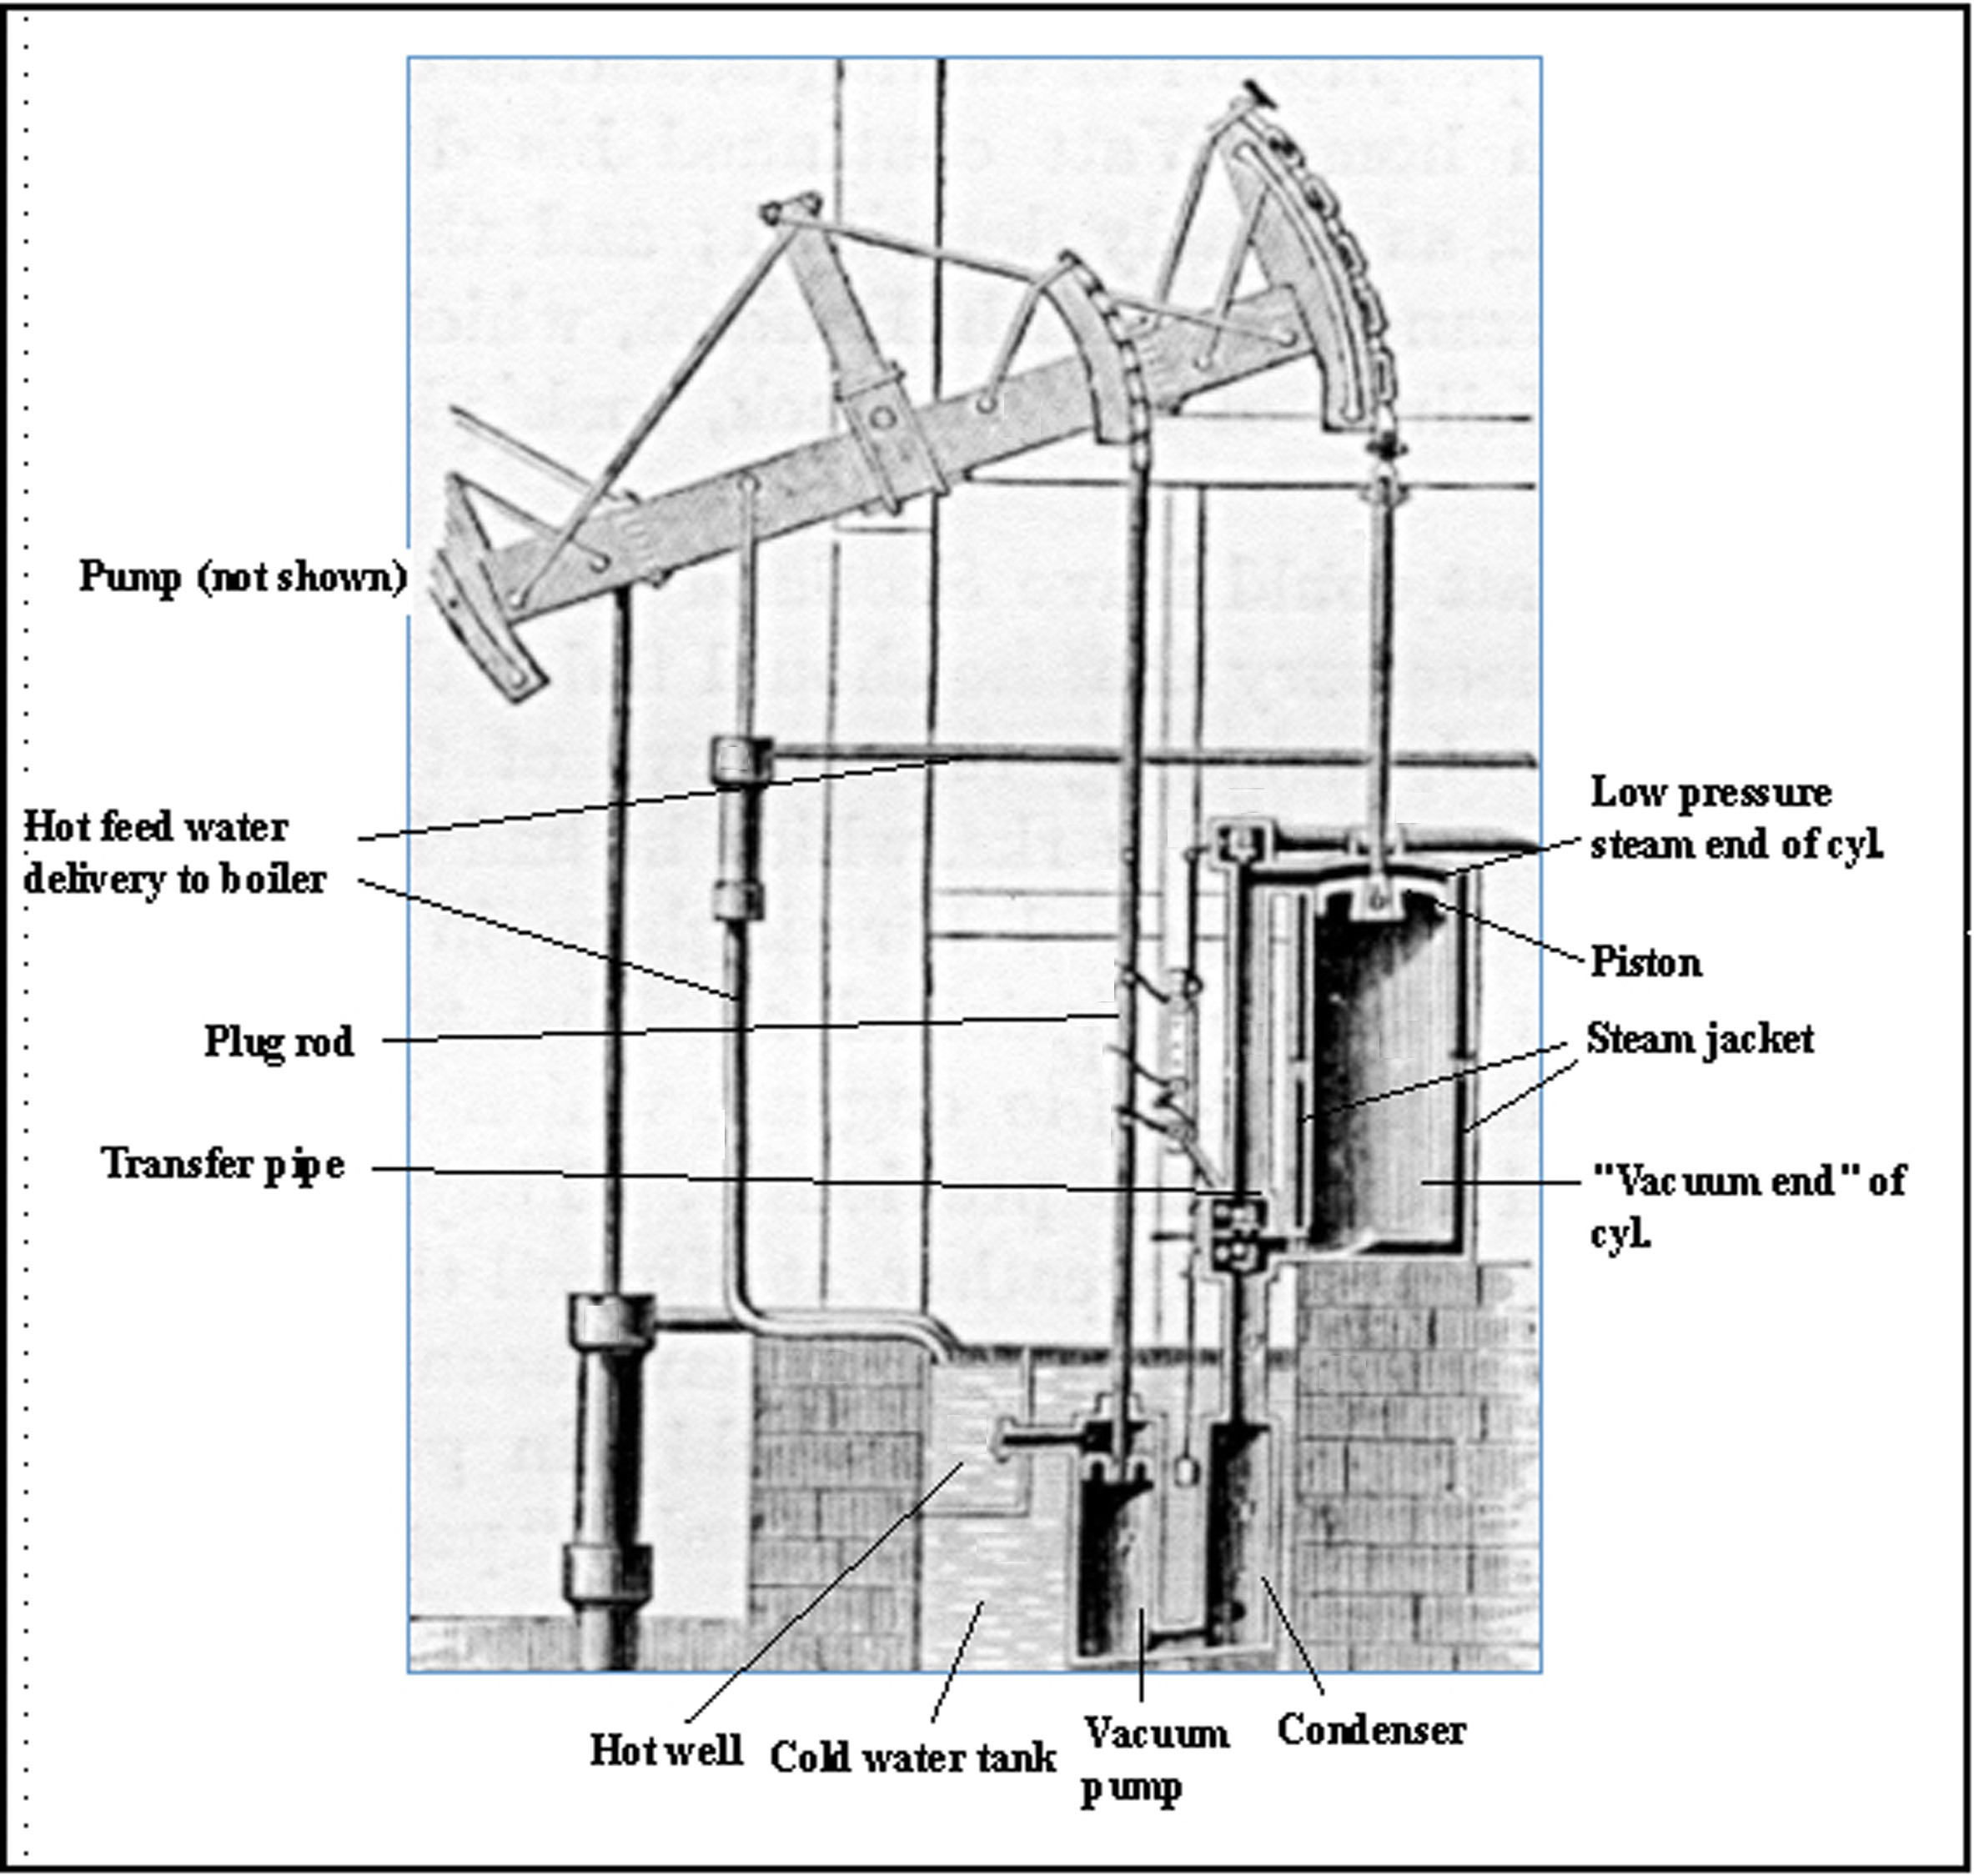 James Watt Steam Engine Diagram File Watt Steam Pumping Engine Jpg Wikimedia Mons Of James Watt Steam Engine Diagram